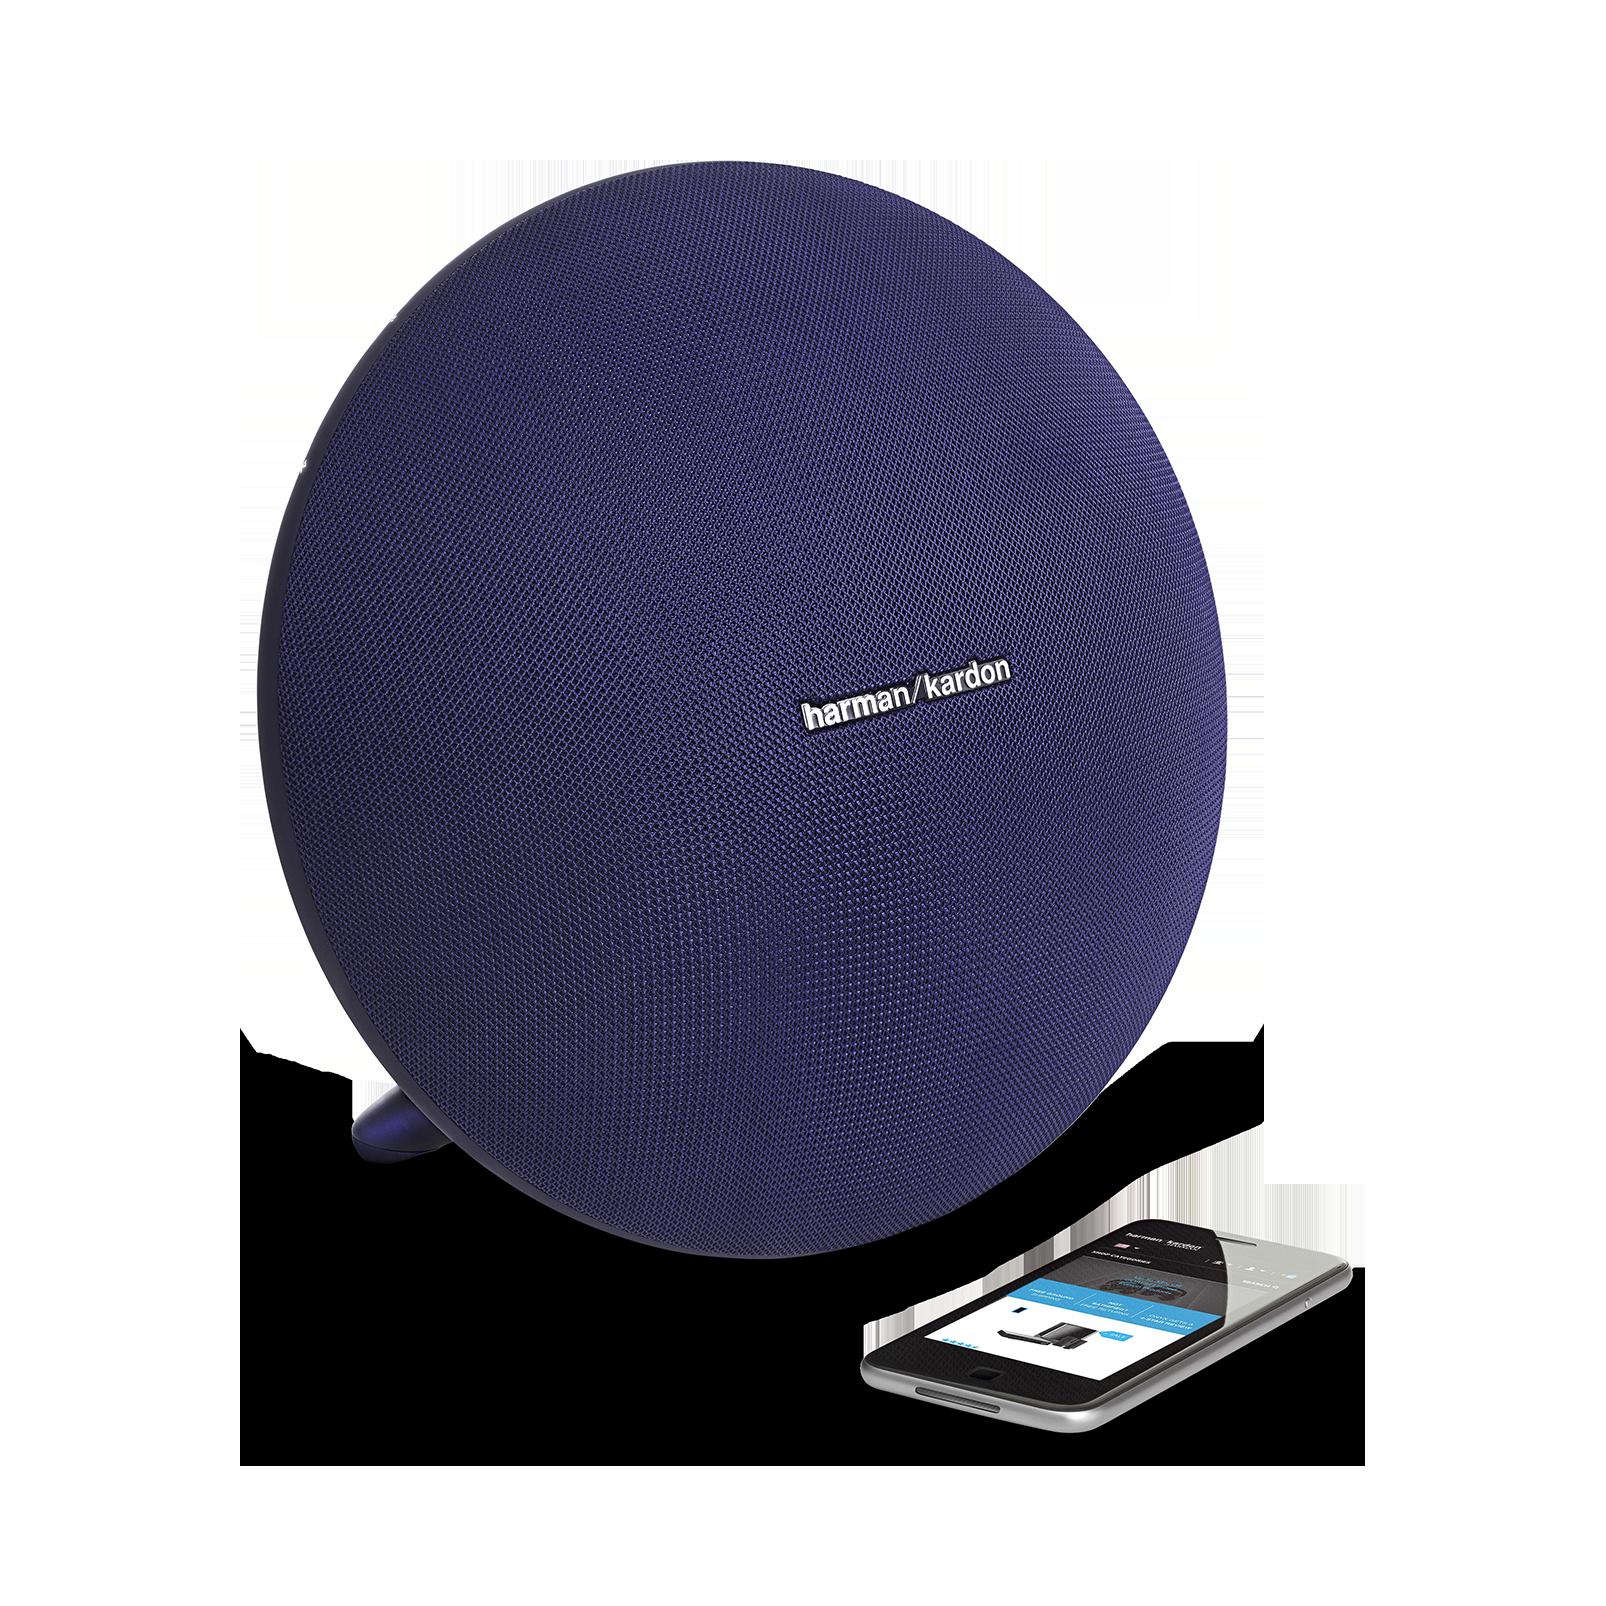 Onyx Studio 3 - Blue - Portable Bluetooth Speaker - Detailshot 1